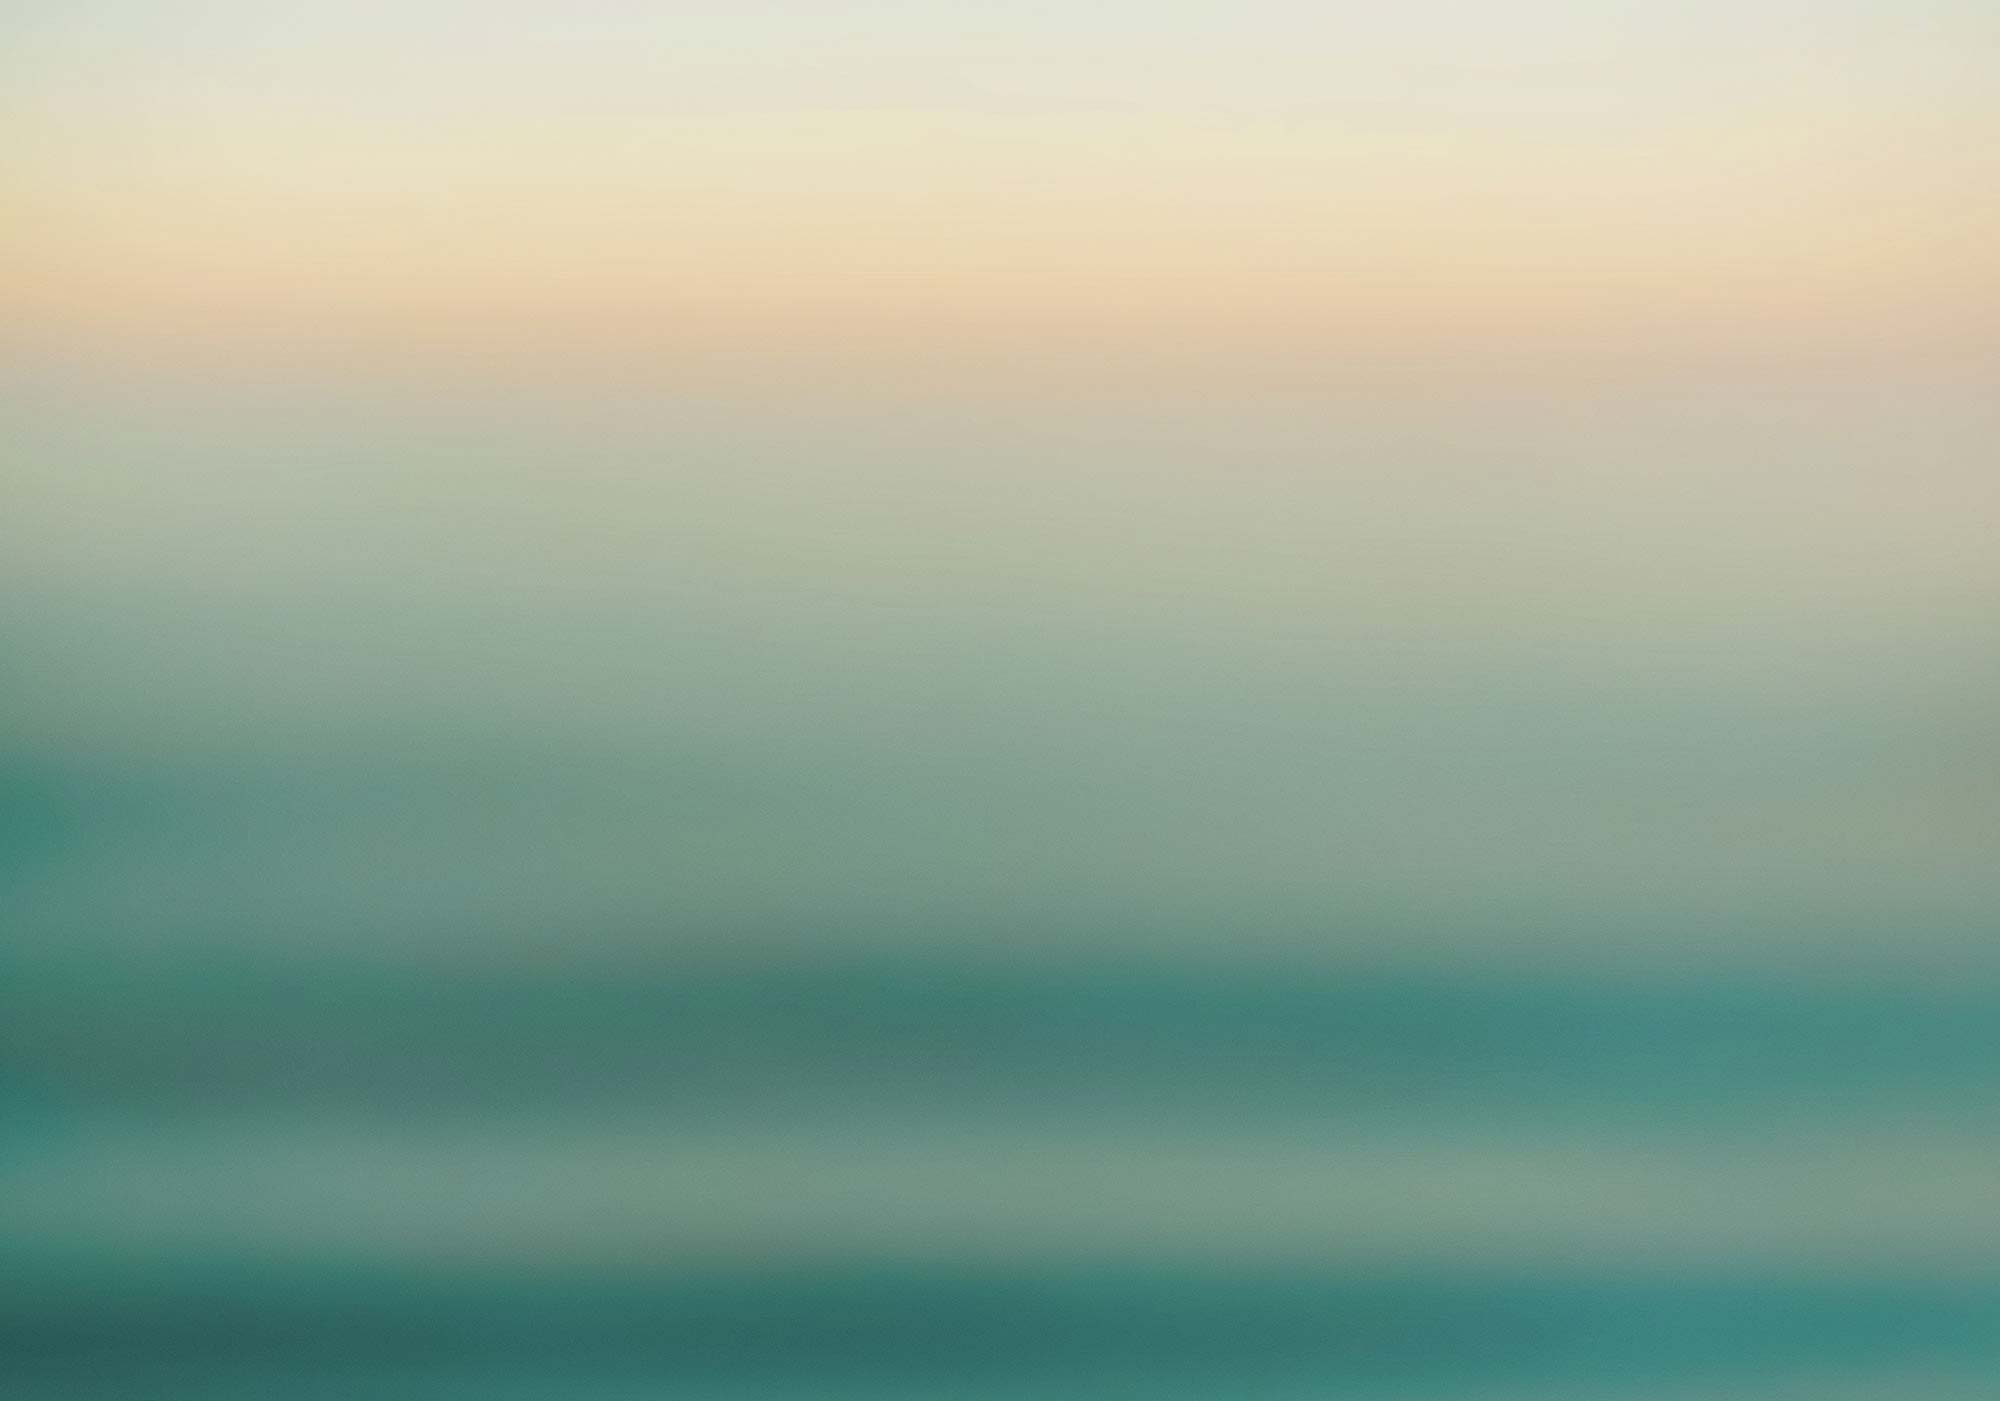 Komar_Tapete_grün_Ocean_Sense_1